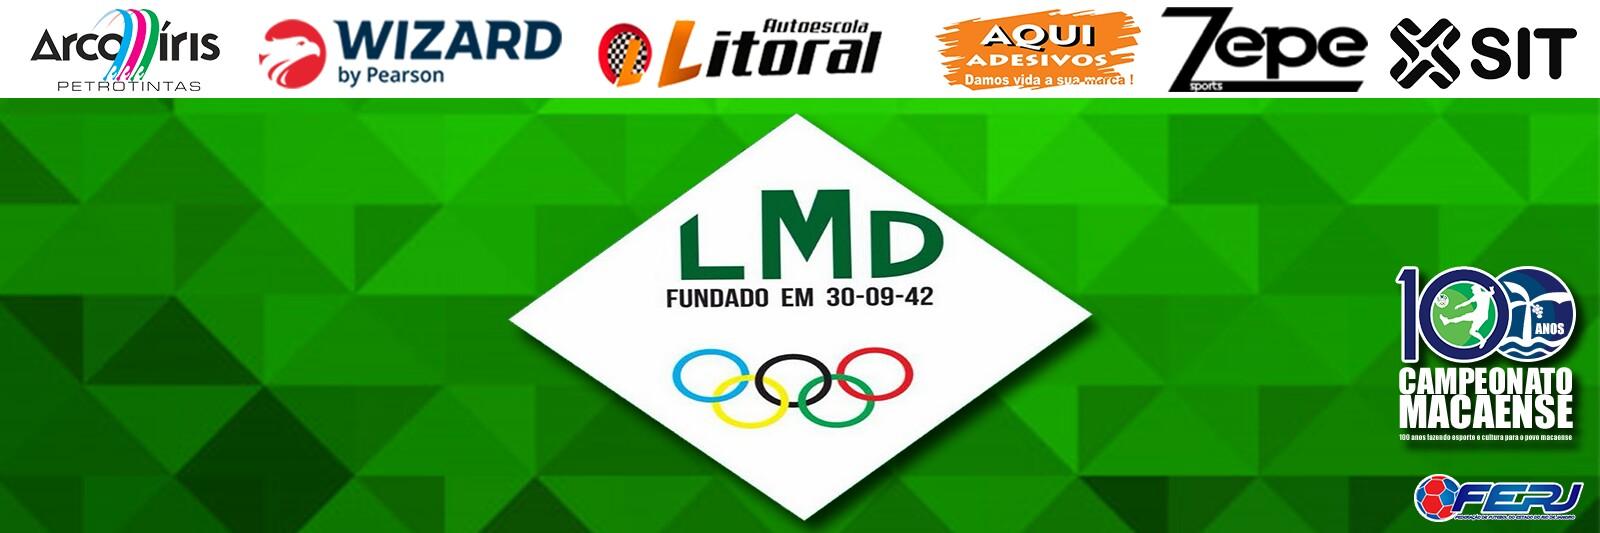 Campeonato ALTERNATIVA Macaense 2019